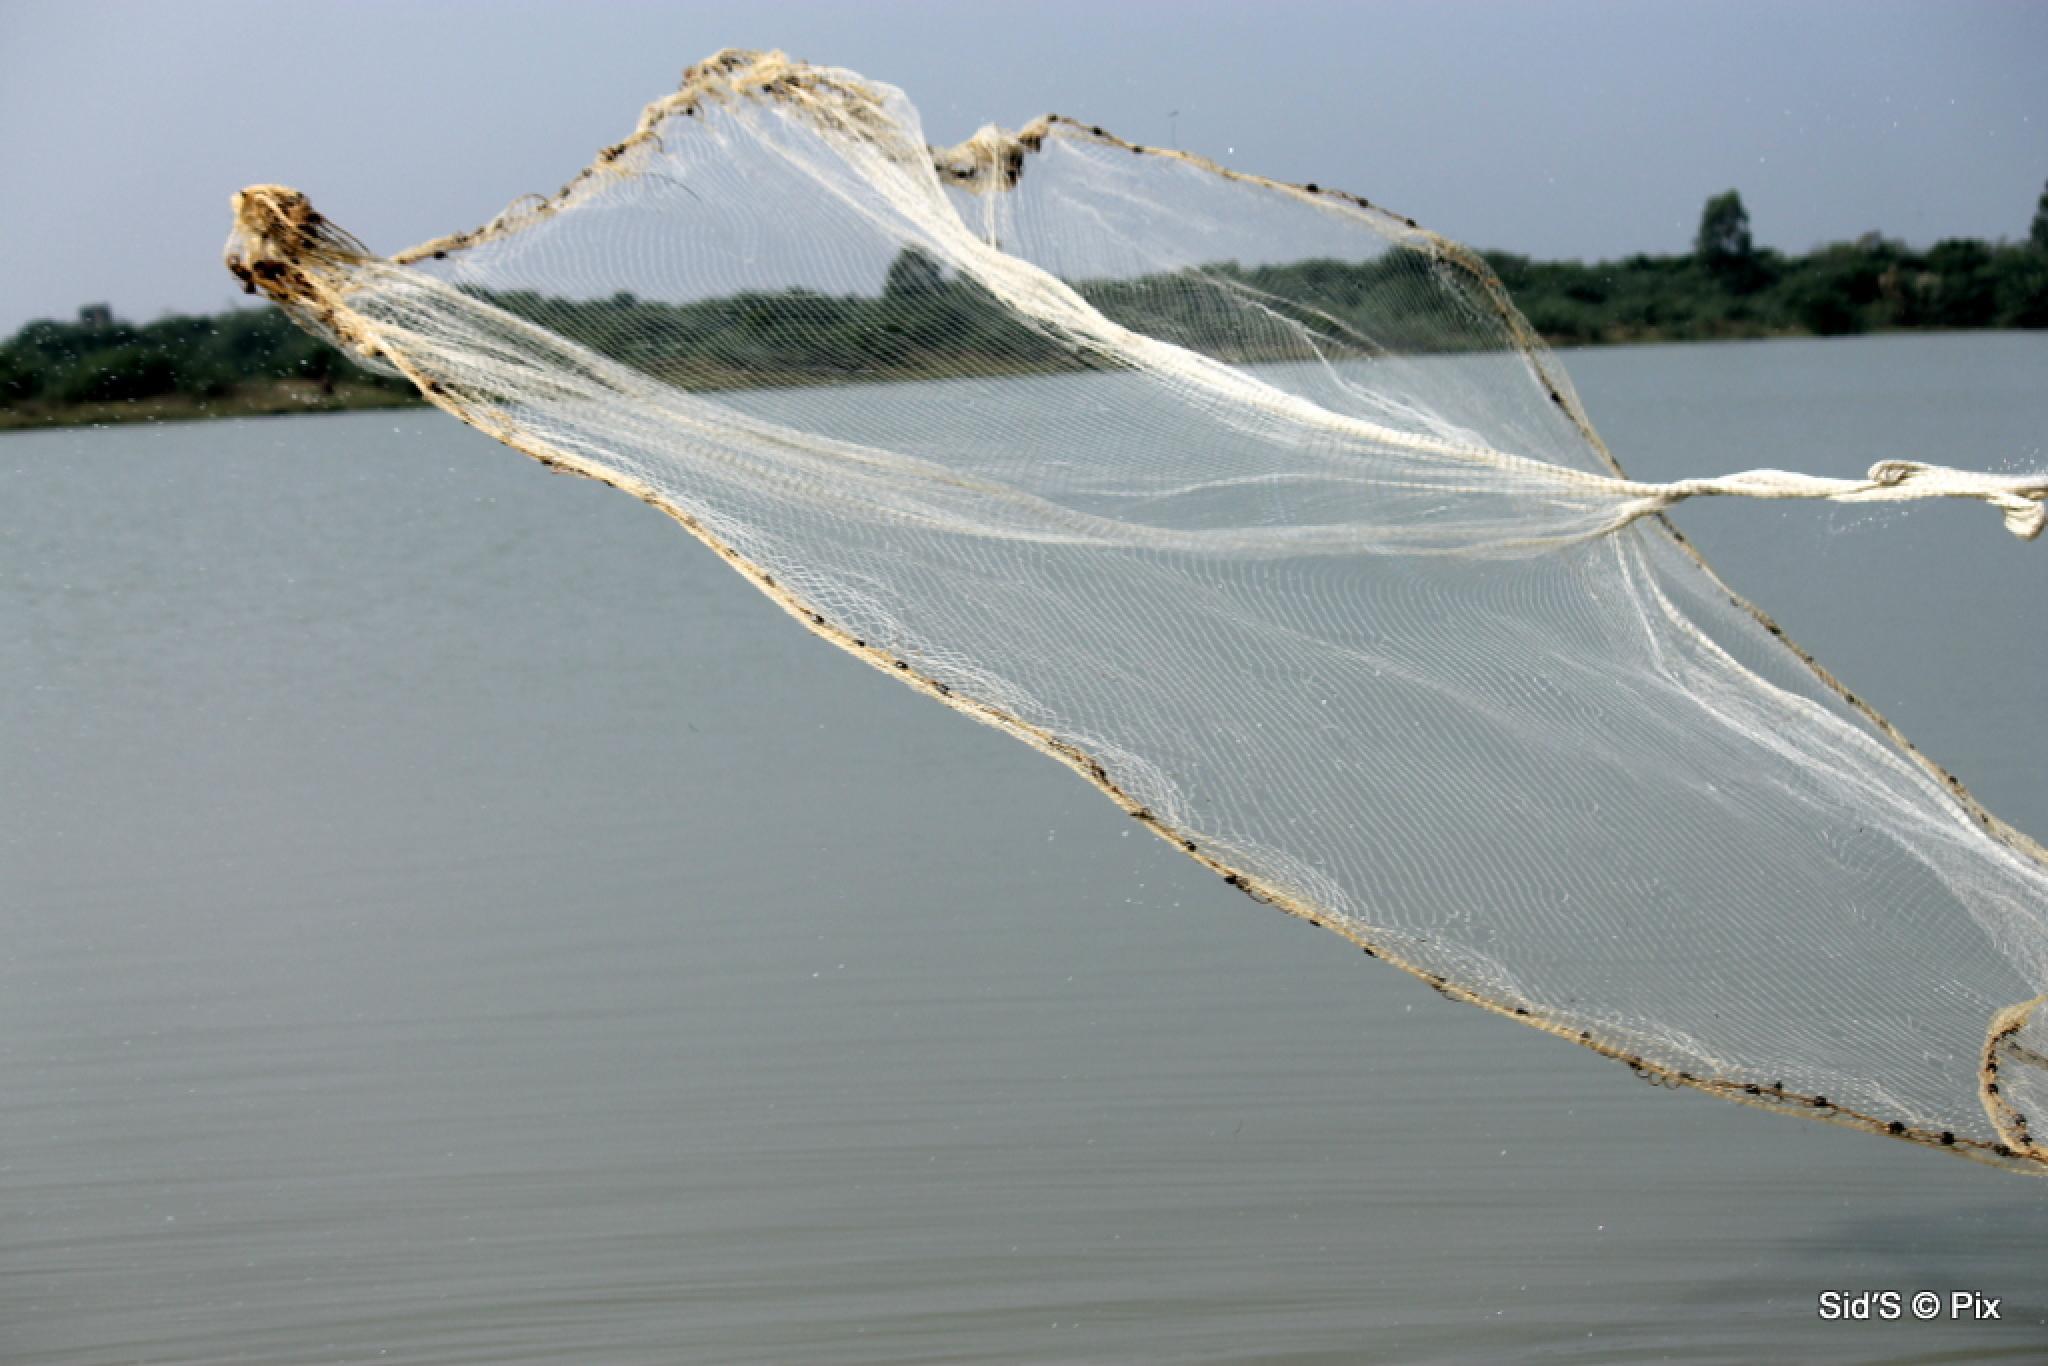 The Fishing Net by Siddharth Sanyal